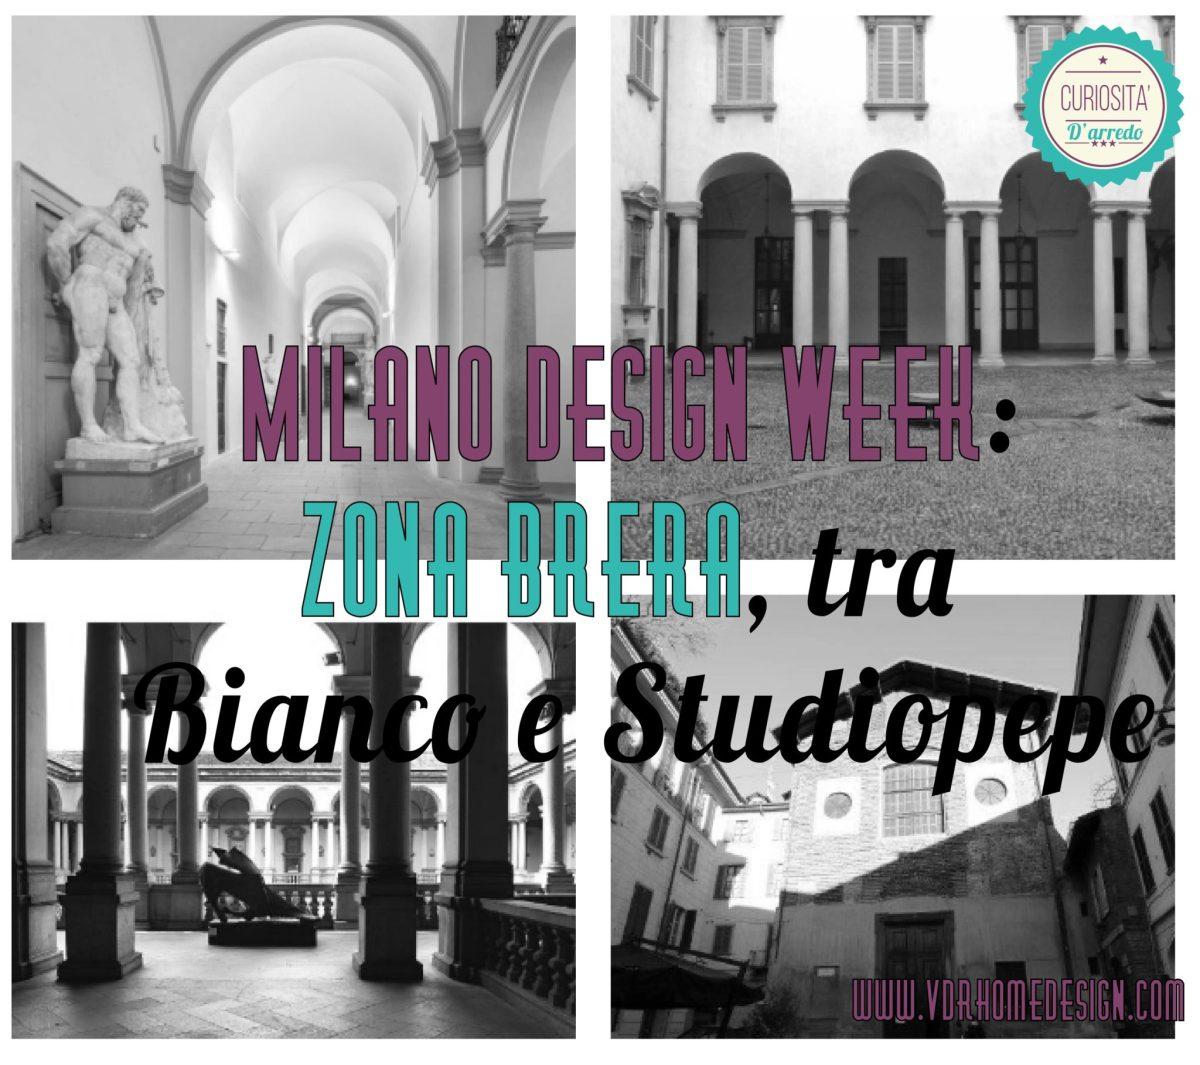 Milano Design Week: zona Brera, tra Bianco e Studiopepe